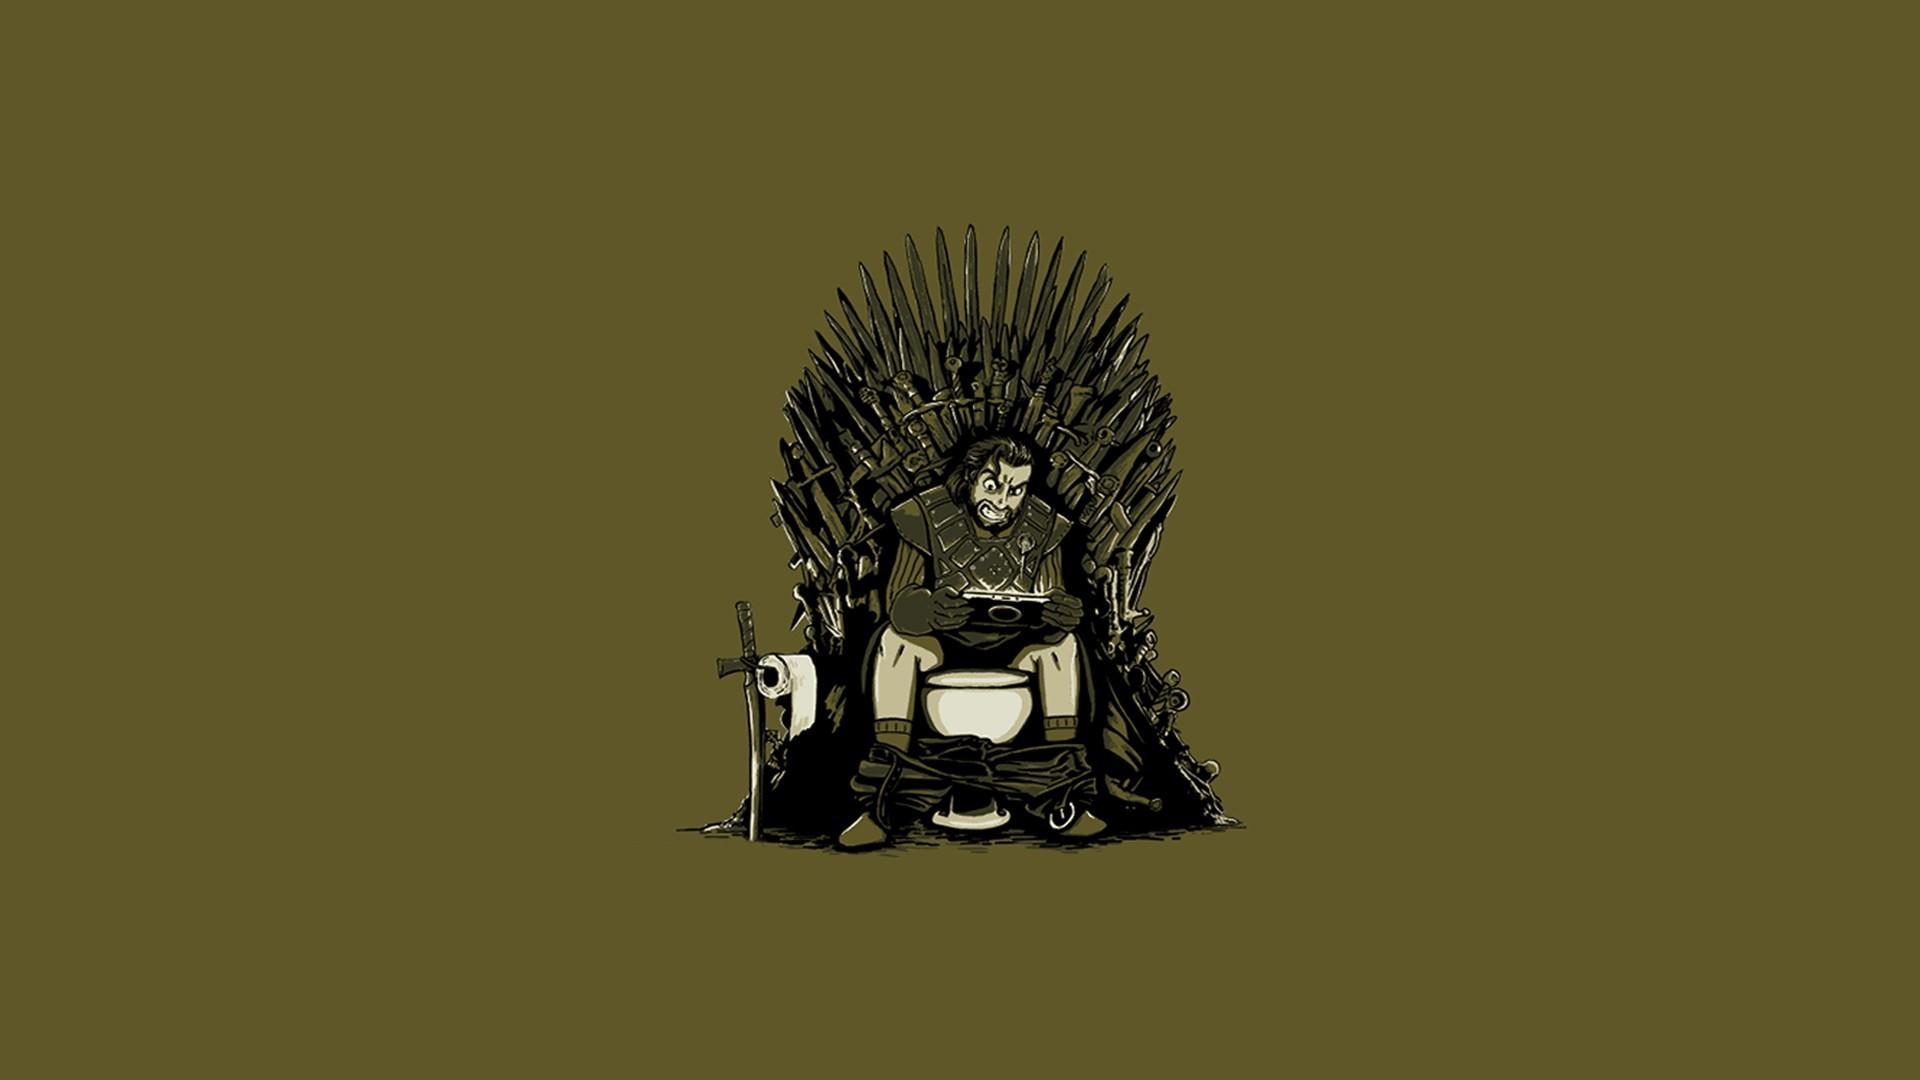 wallpaper minimalistic · Game of Thrones